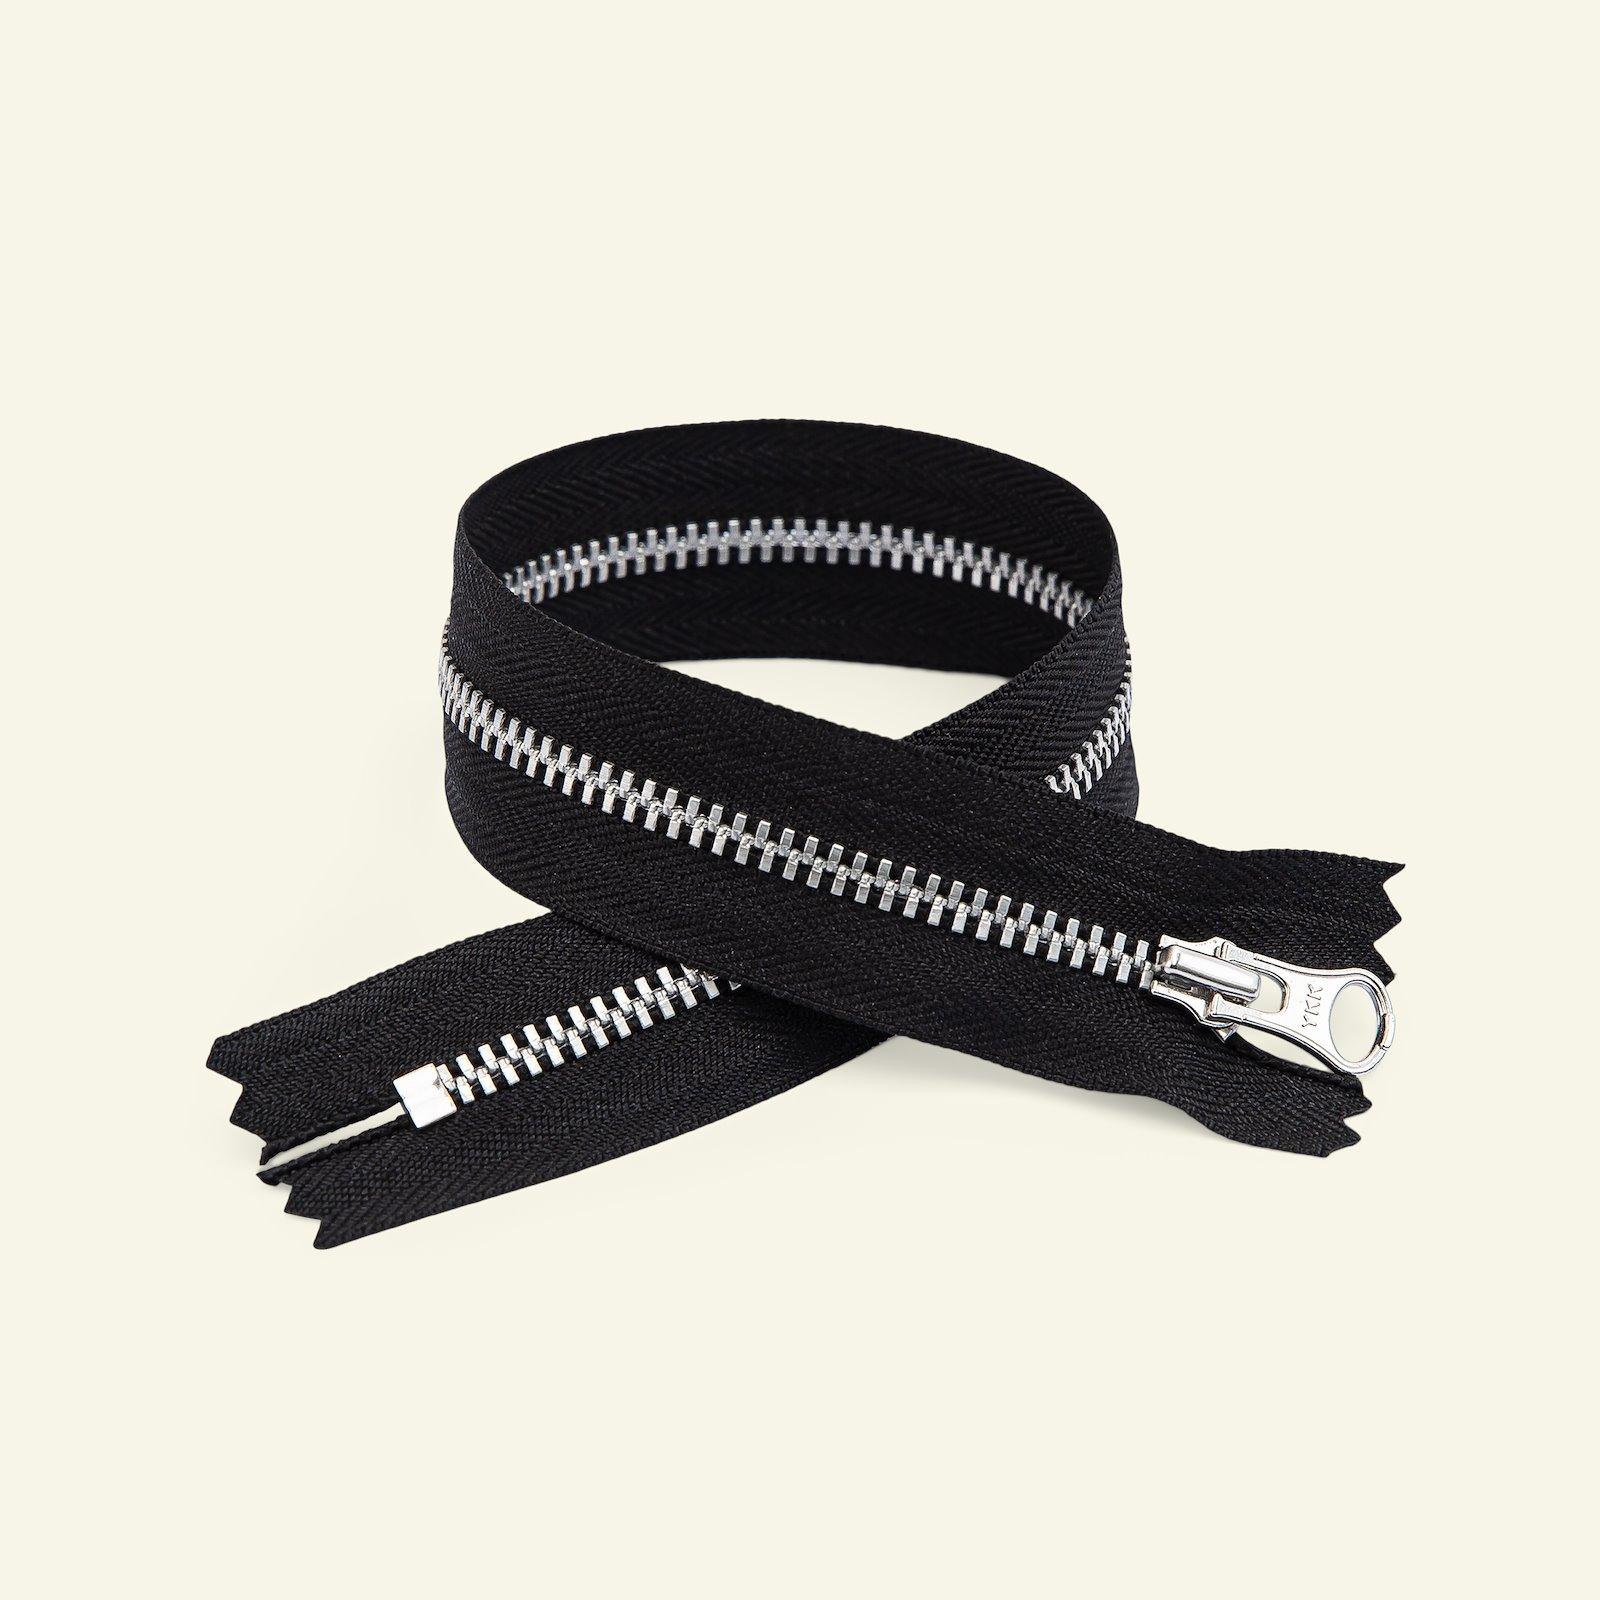 YKK zip 4mm closed end 18cm black/silver x59687_pack